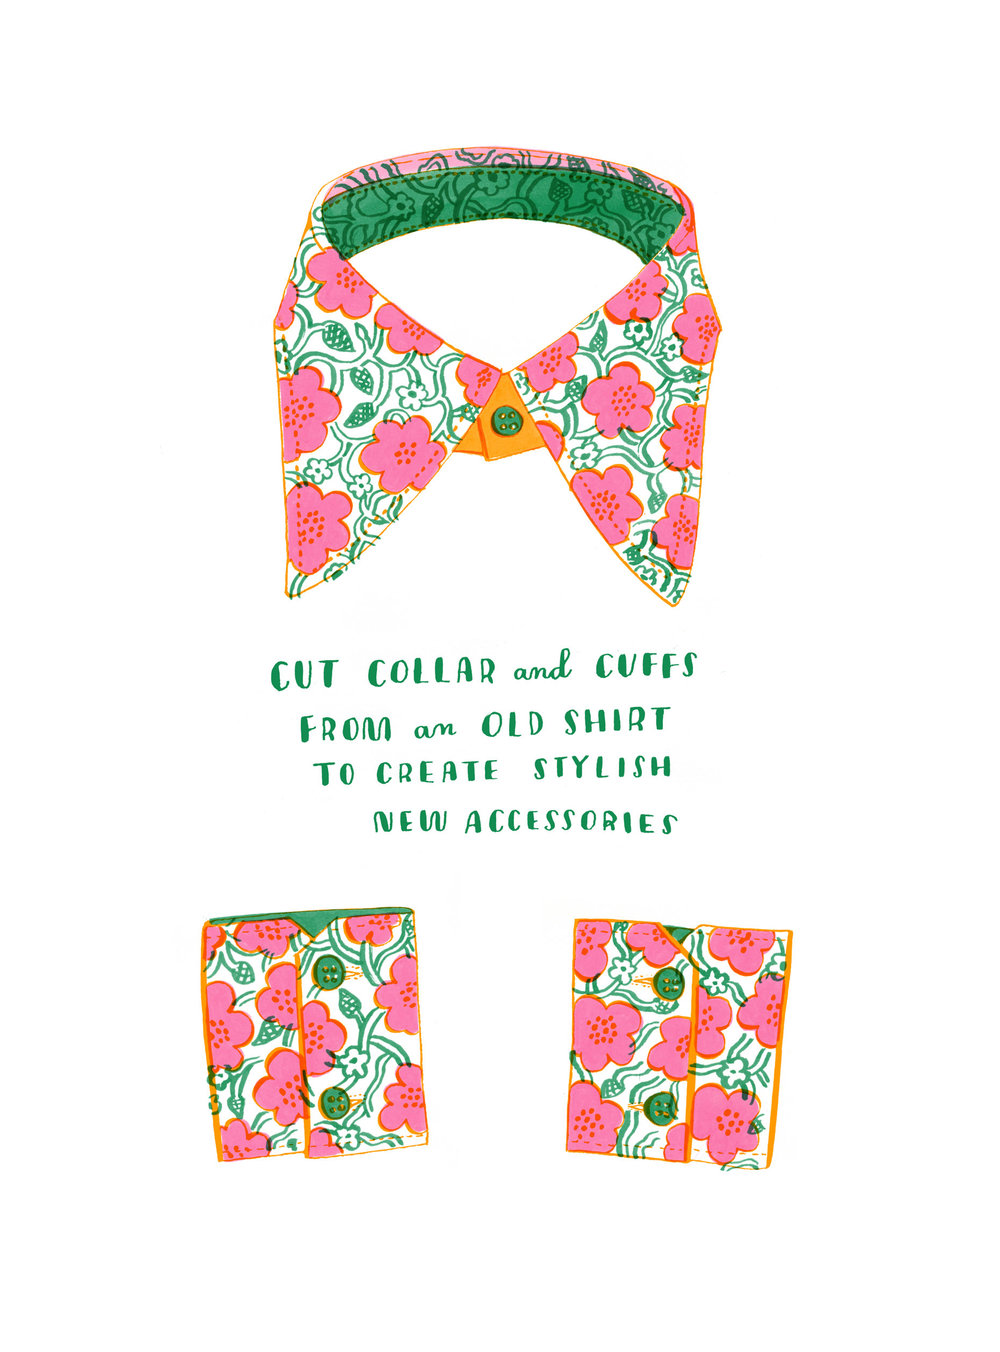 Collar_cuffs.jpg